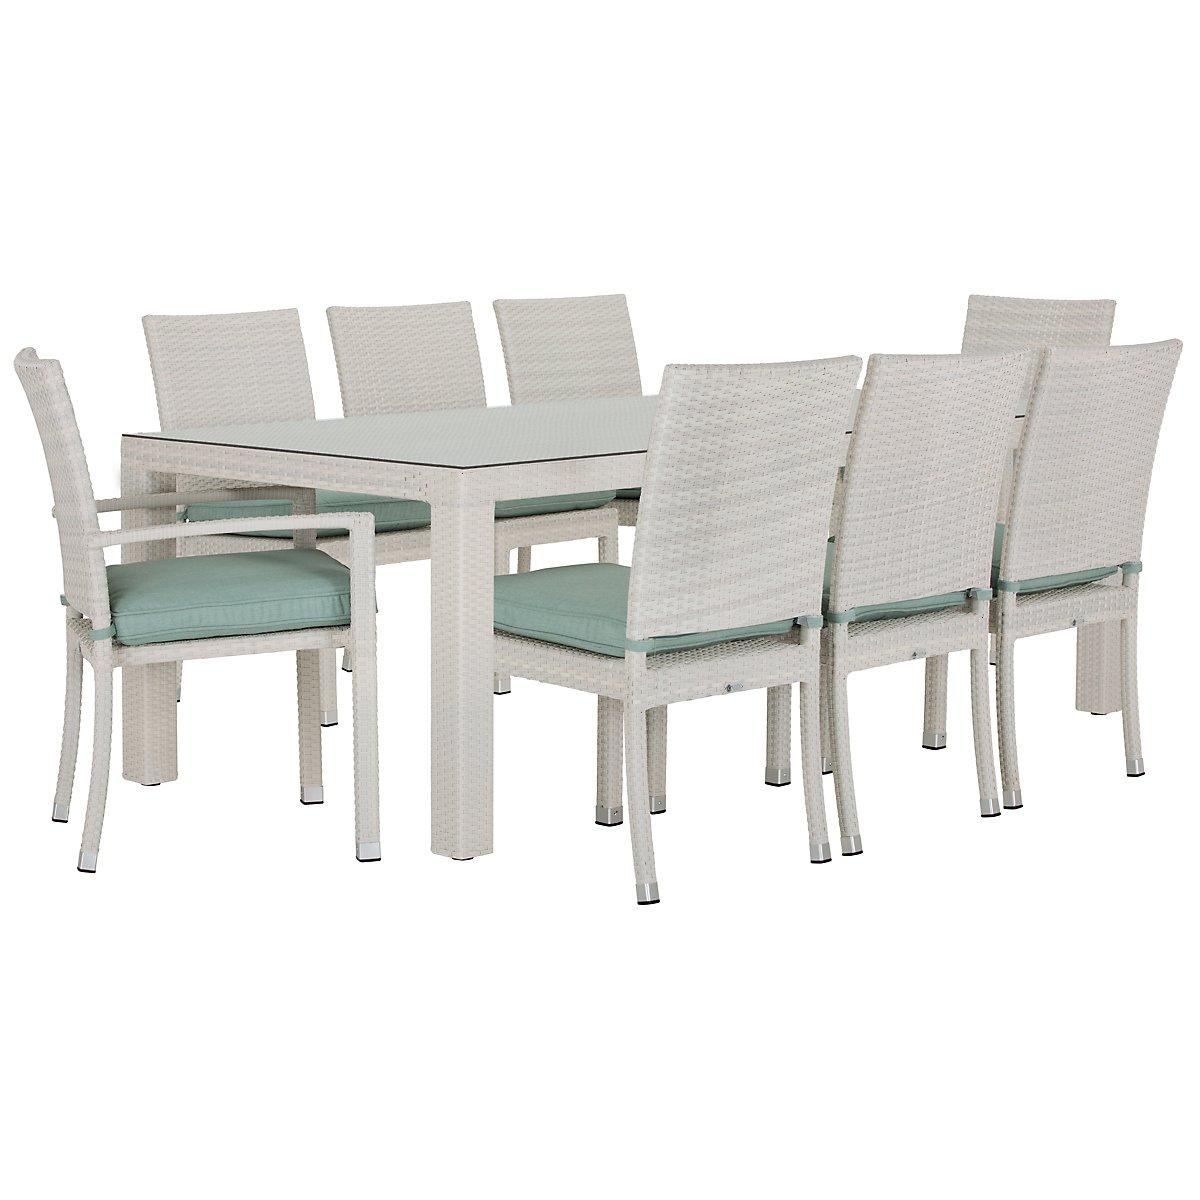 "Bahia Teal 84"" Rectangular Table & 4 Chairs"